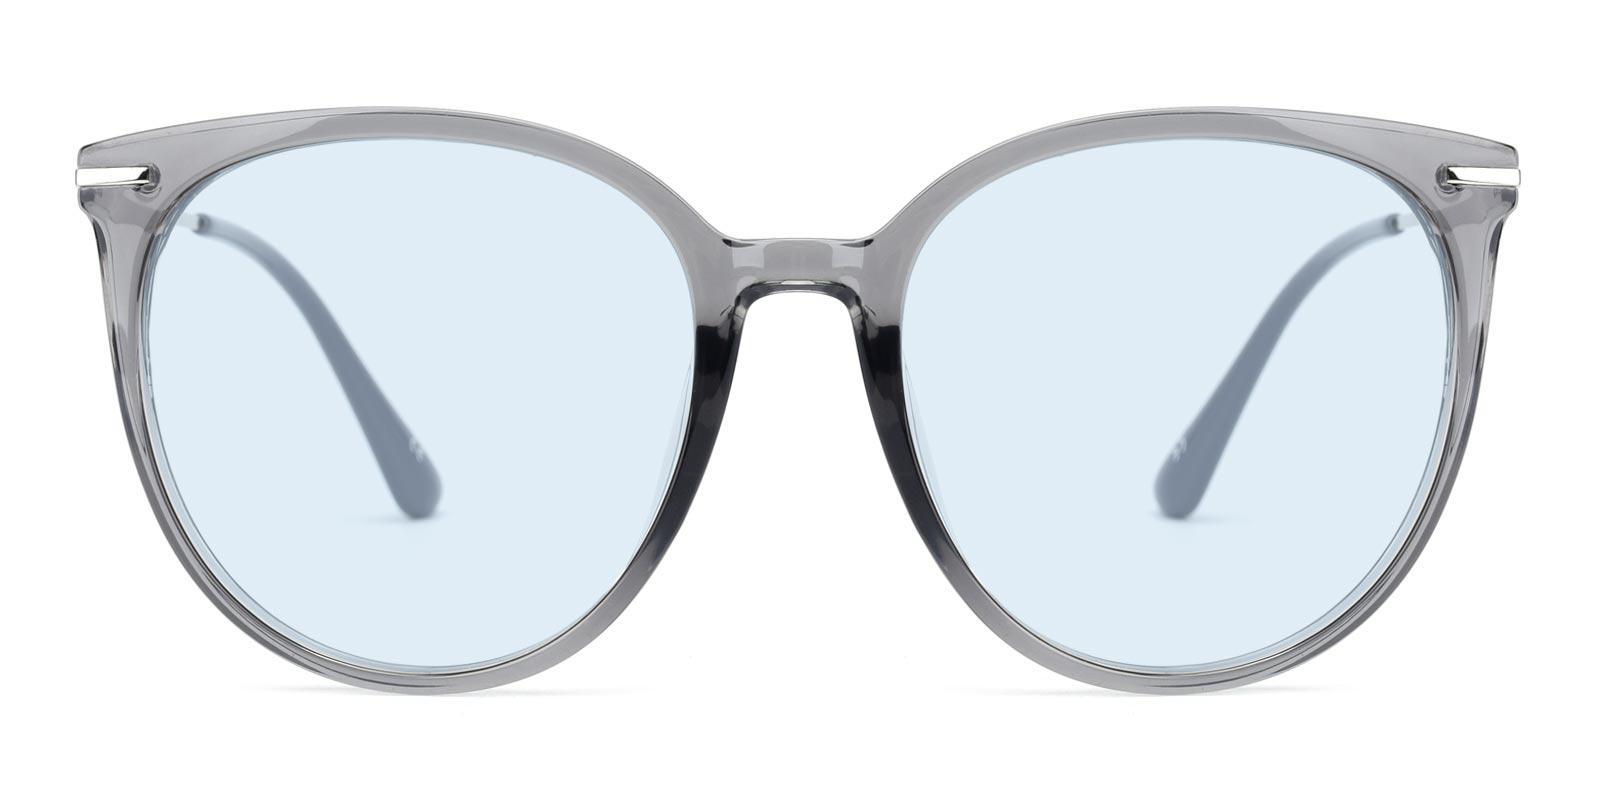 Memoria-Gray-Round / Cat-Metal / Combination / TR-Sunglasses-detail